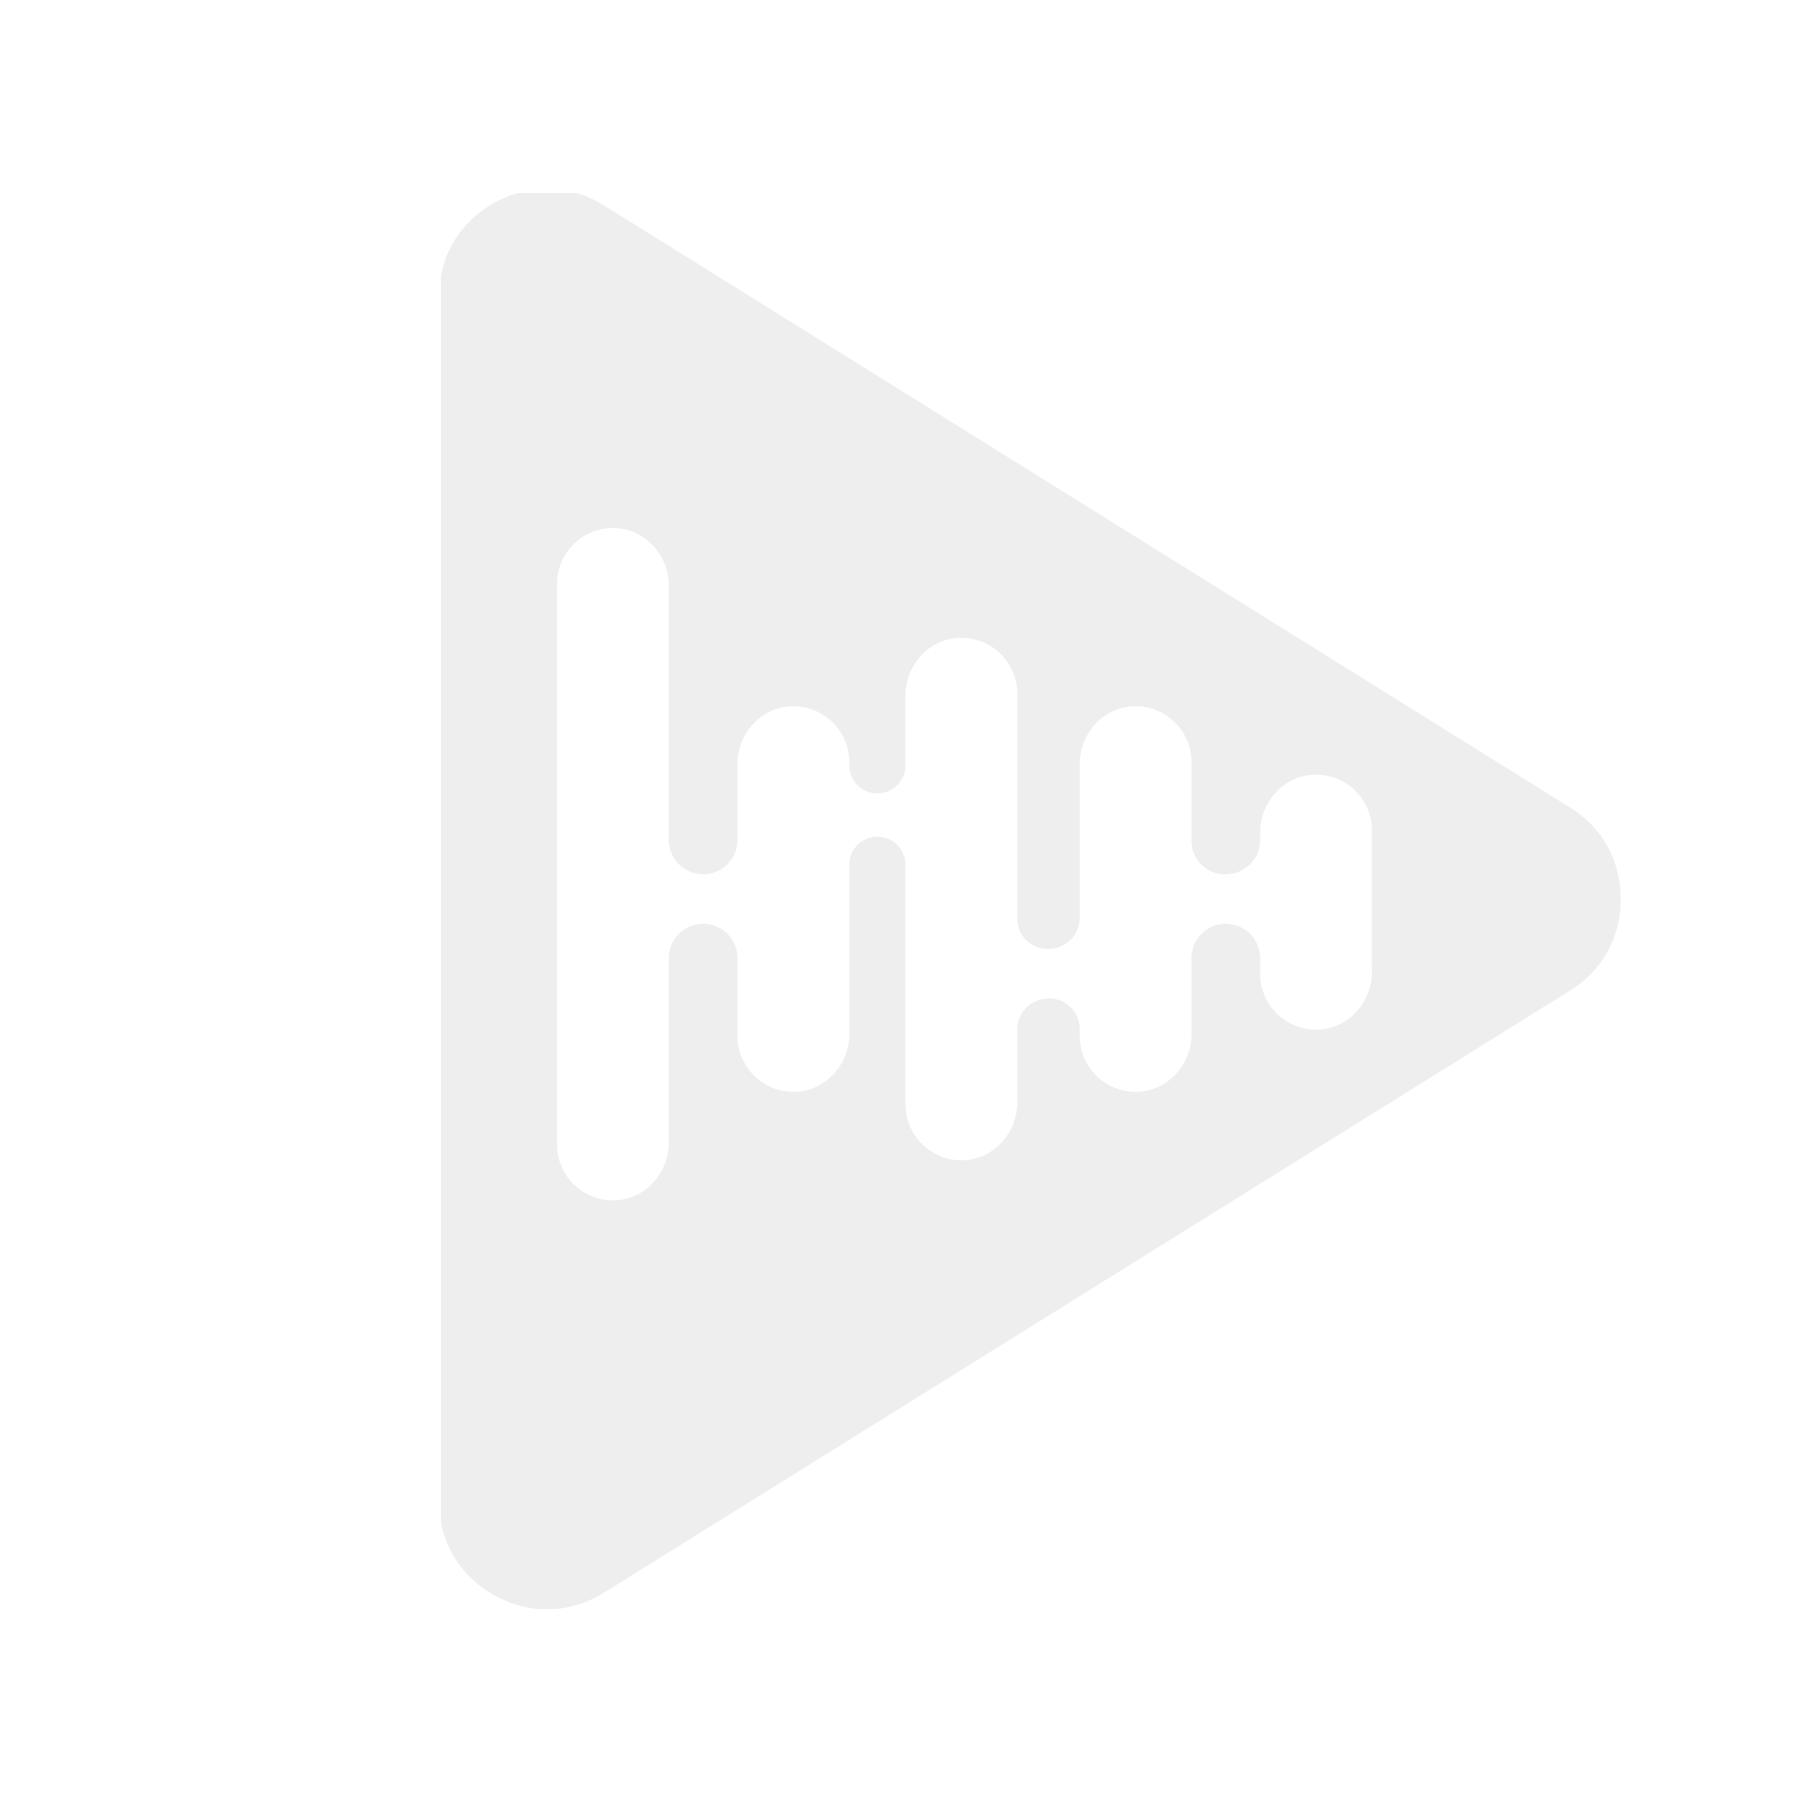 Speedsignal C-3474101